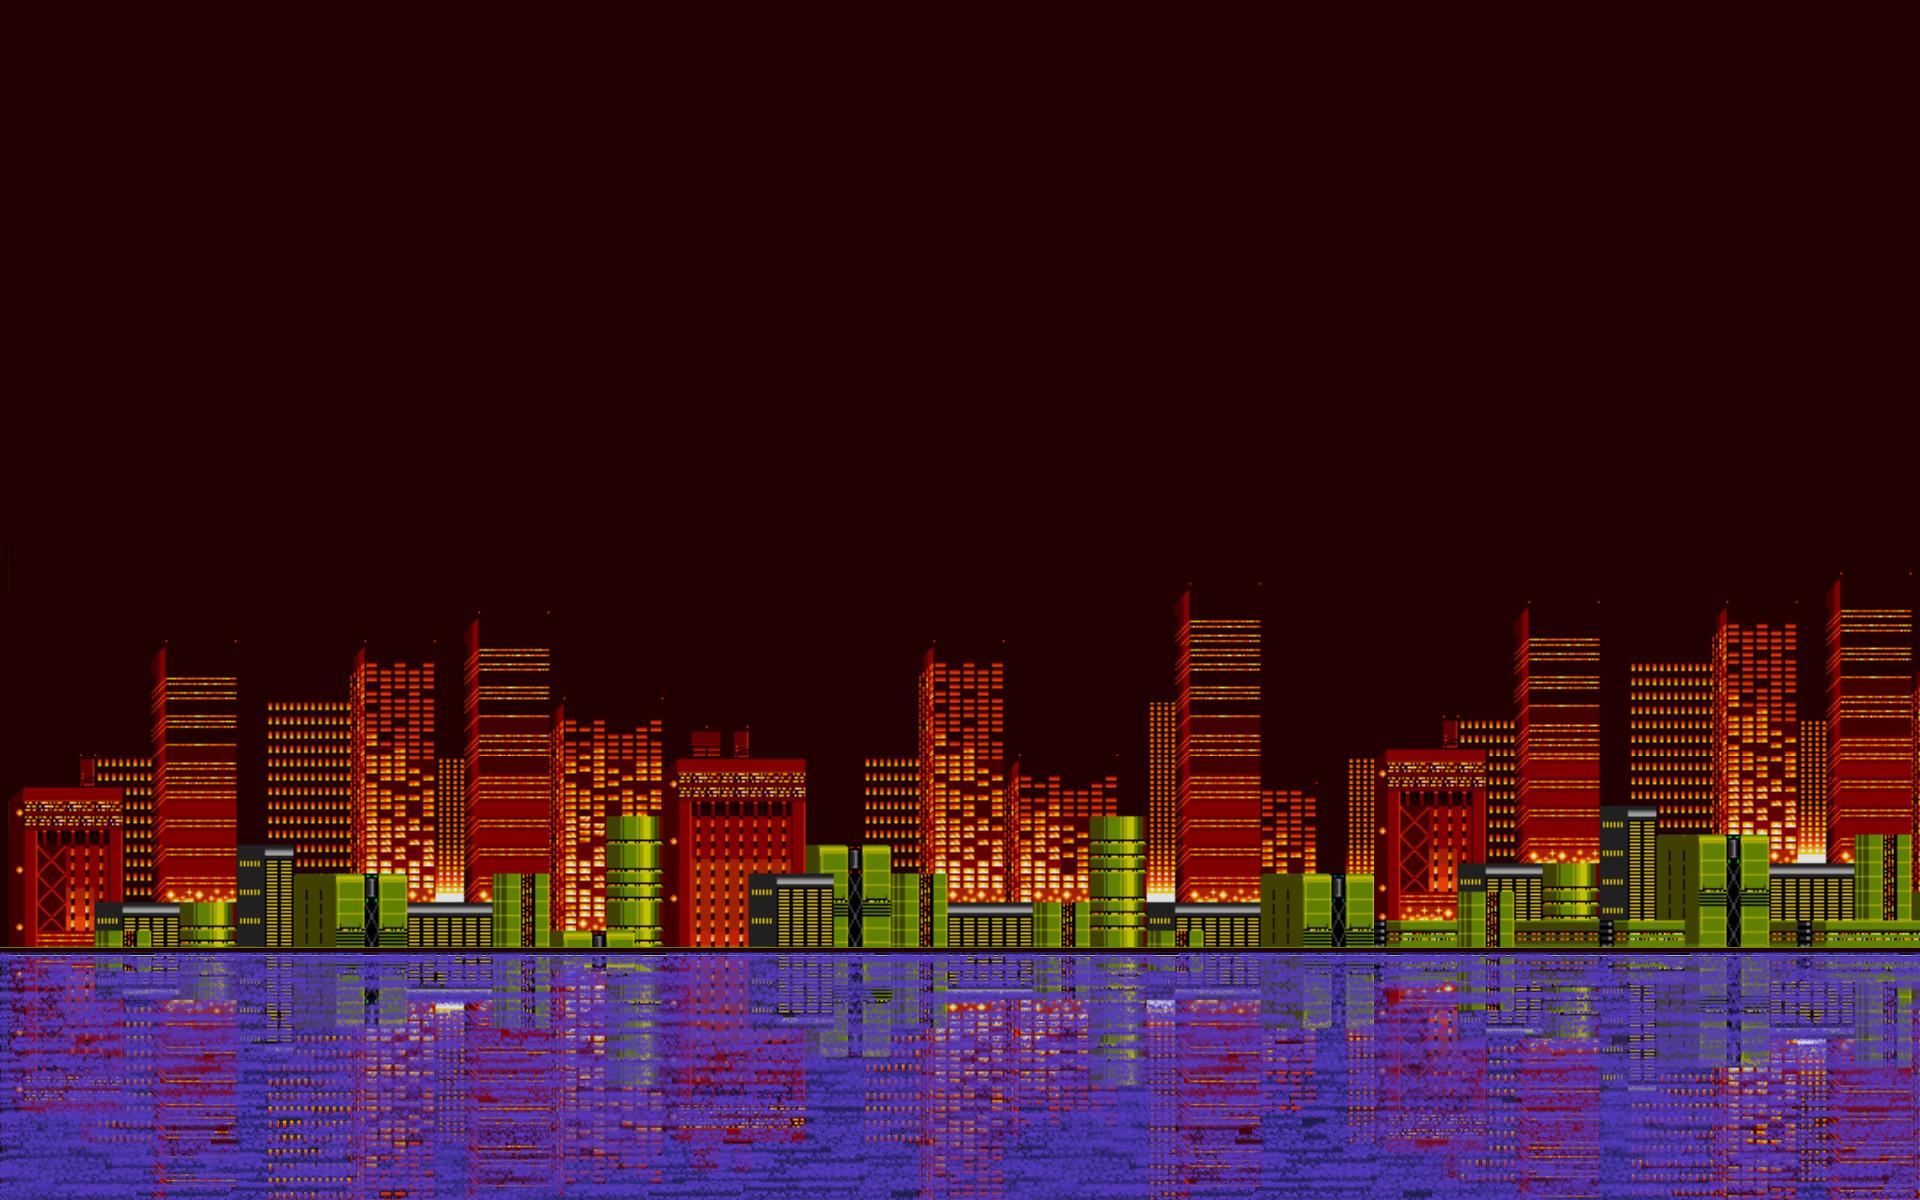 General pixel art 16-bit Sega Sonic the Hedgehog city reflection